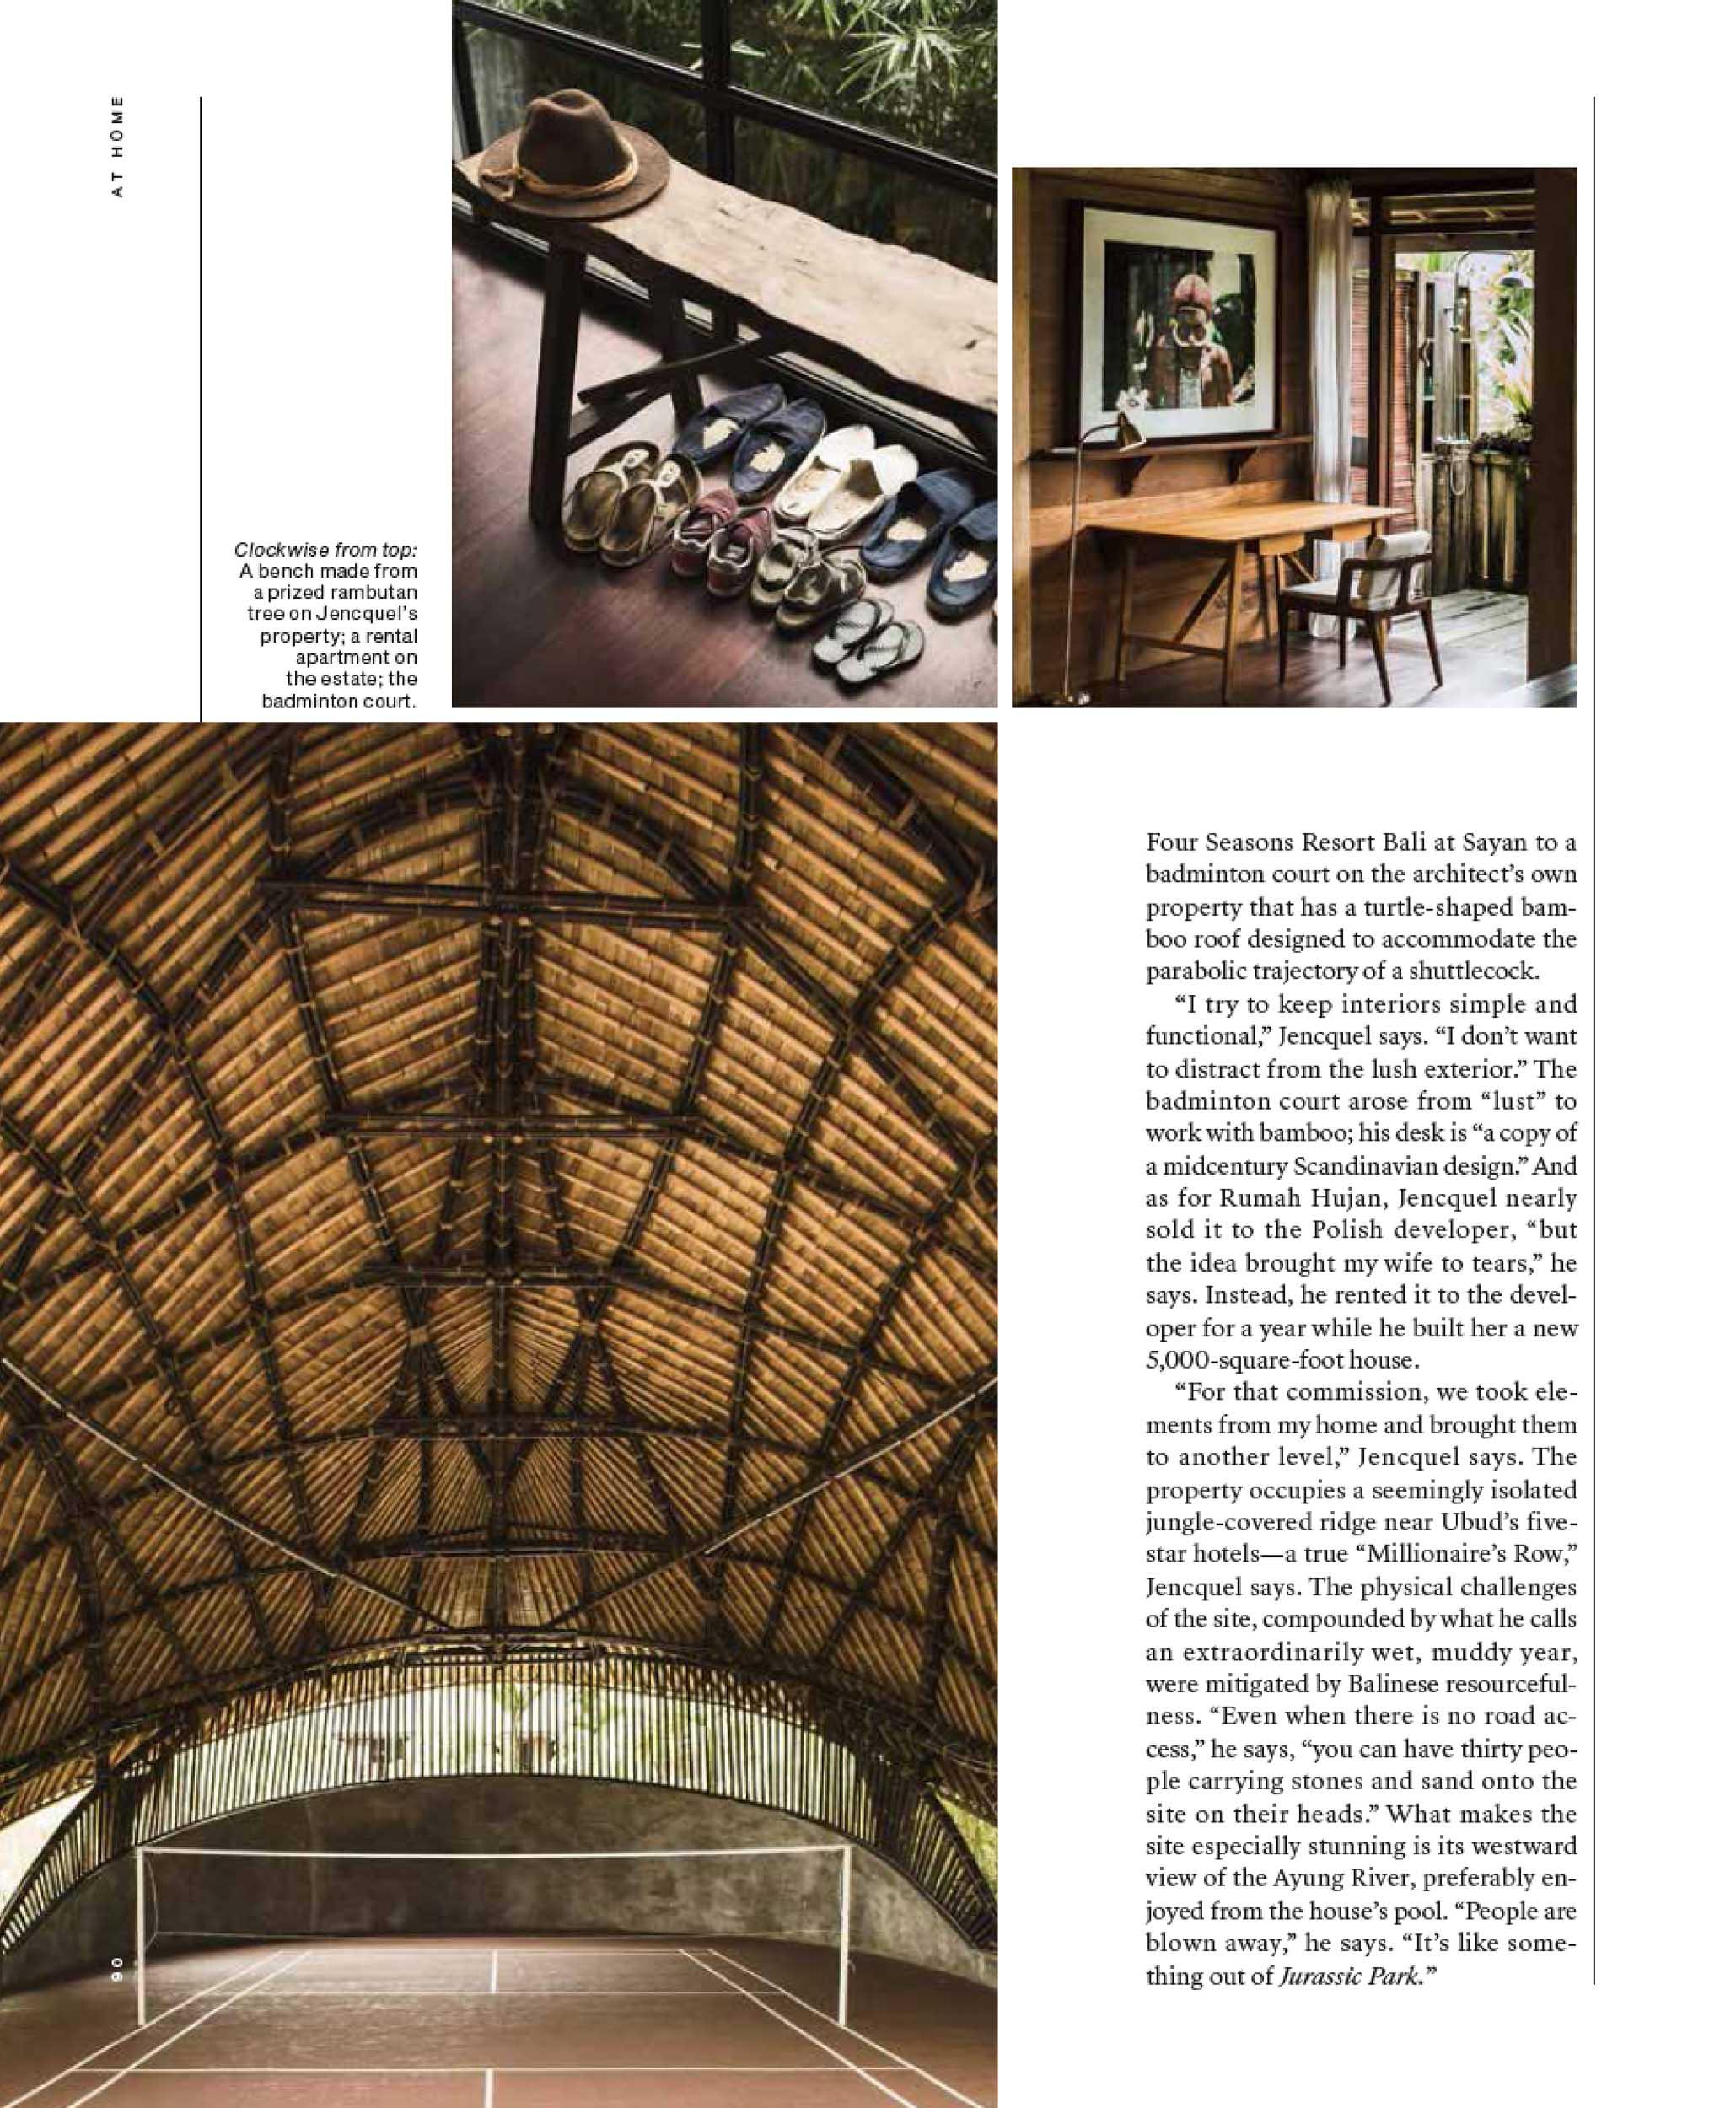 departures-magazine-maximilian-jenquel-bali-tommaso-riva-lisa-scappin-interiors-bamboo (4 of 4).jpg